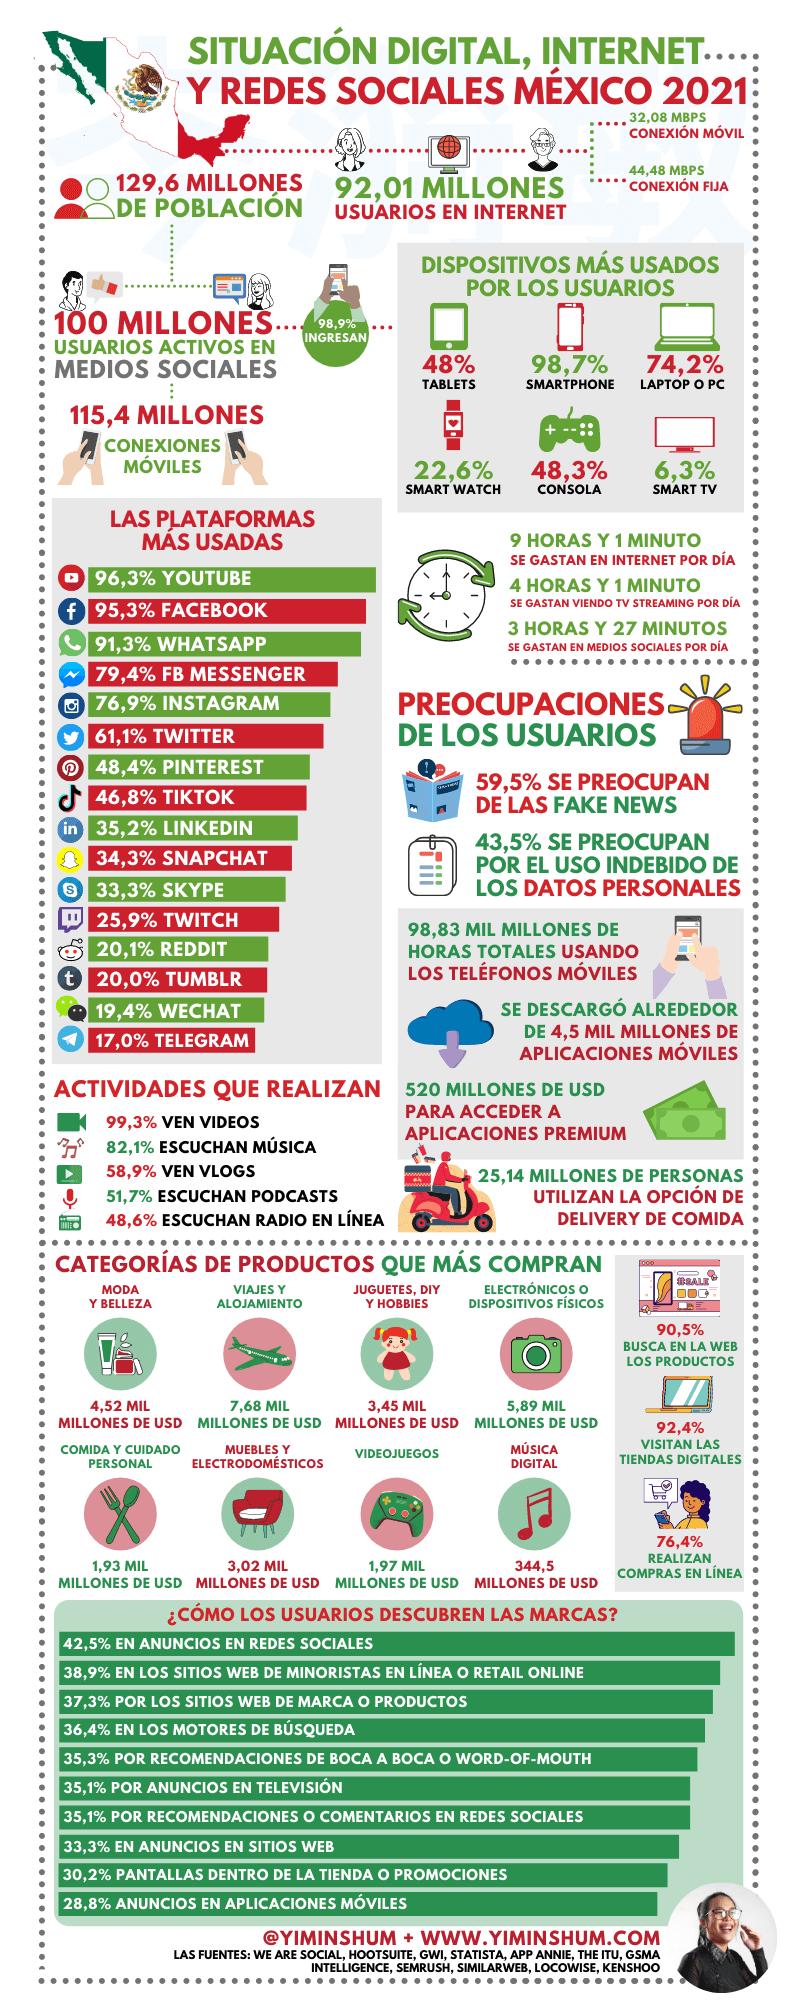 Internet y redes sociales en México 2021 #infografia #infographic #socialmedia